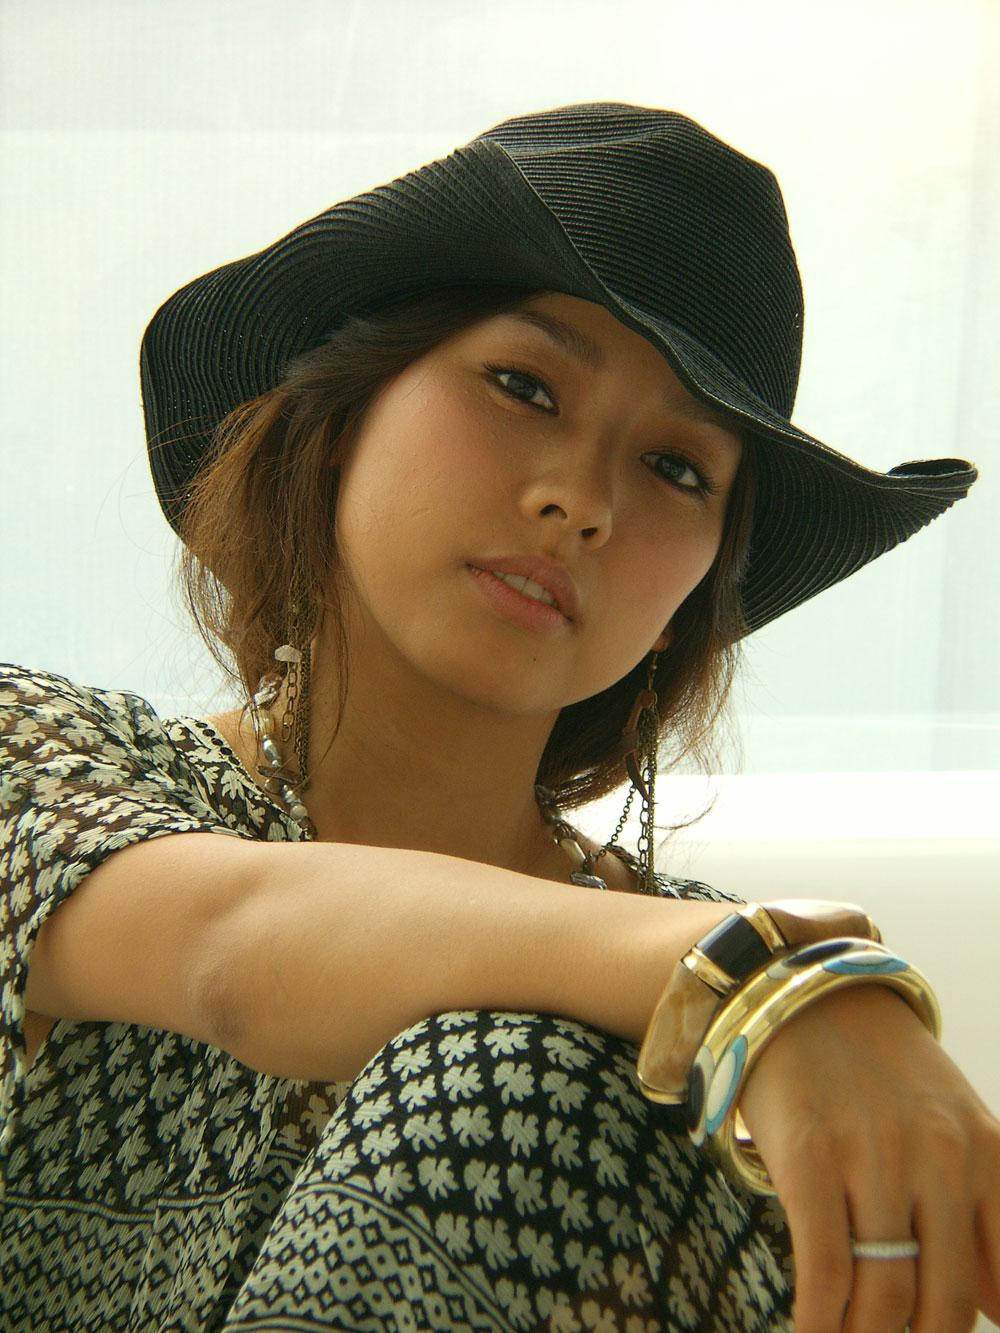 http://photos1.blogger.com/blogger/3803/742/1600/hyorigallery0_b_11.jpg